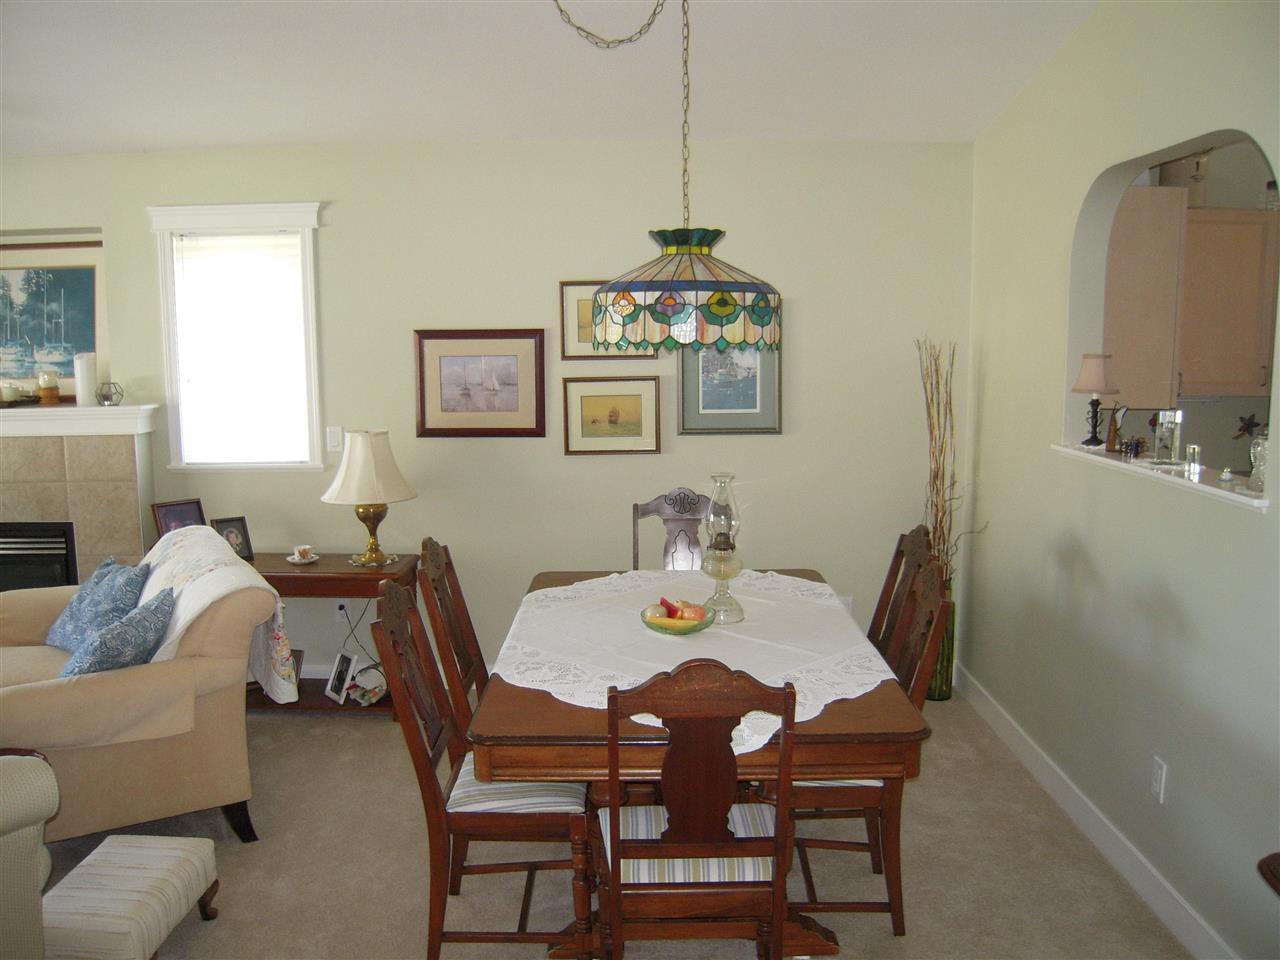 Photo 12: Photos: 5735 EMILY Way in Sechelt: Sechelt District House for sale (Sunshine Coast)  : MLS®# R2179124